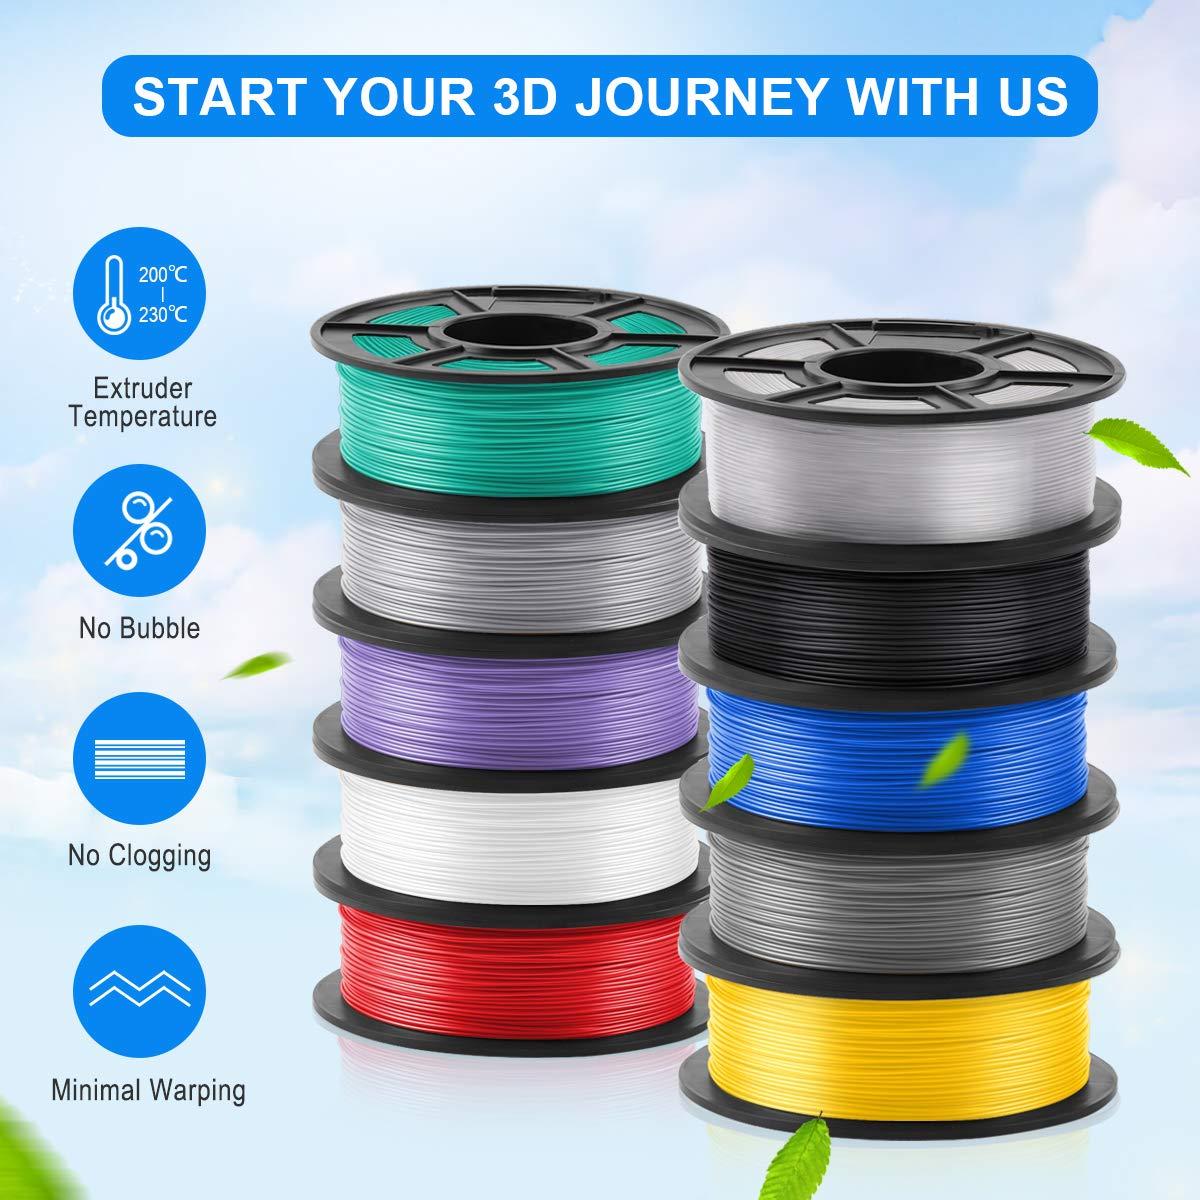 Spool 0.02 mm,1KG ,1.75mm Filament // 3D Warhorse PLA Filament Black,PLA Filament 1.75mm,PLA 3D Printer Filament,Dimensional Accuracy